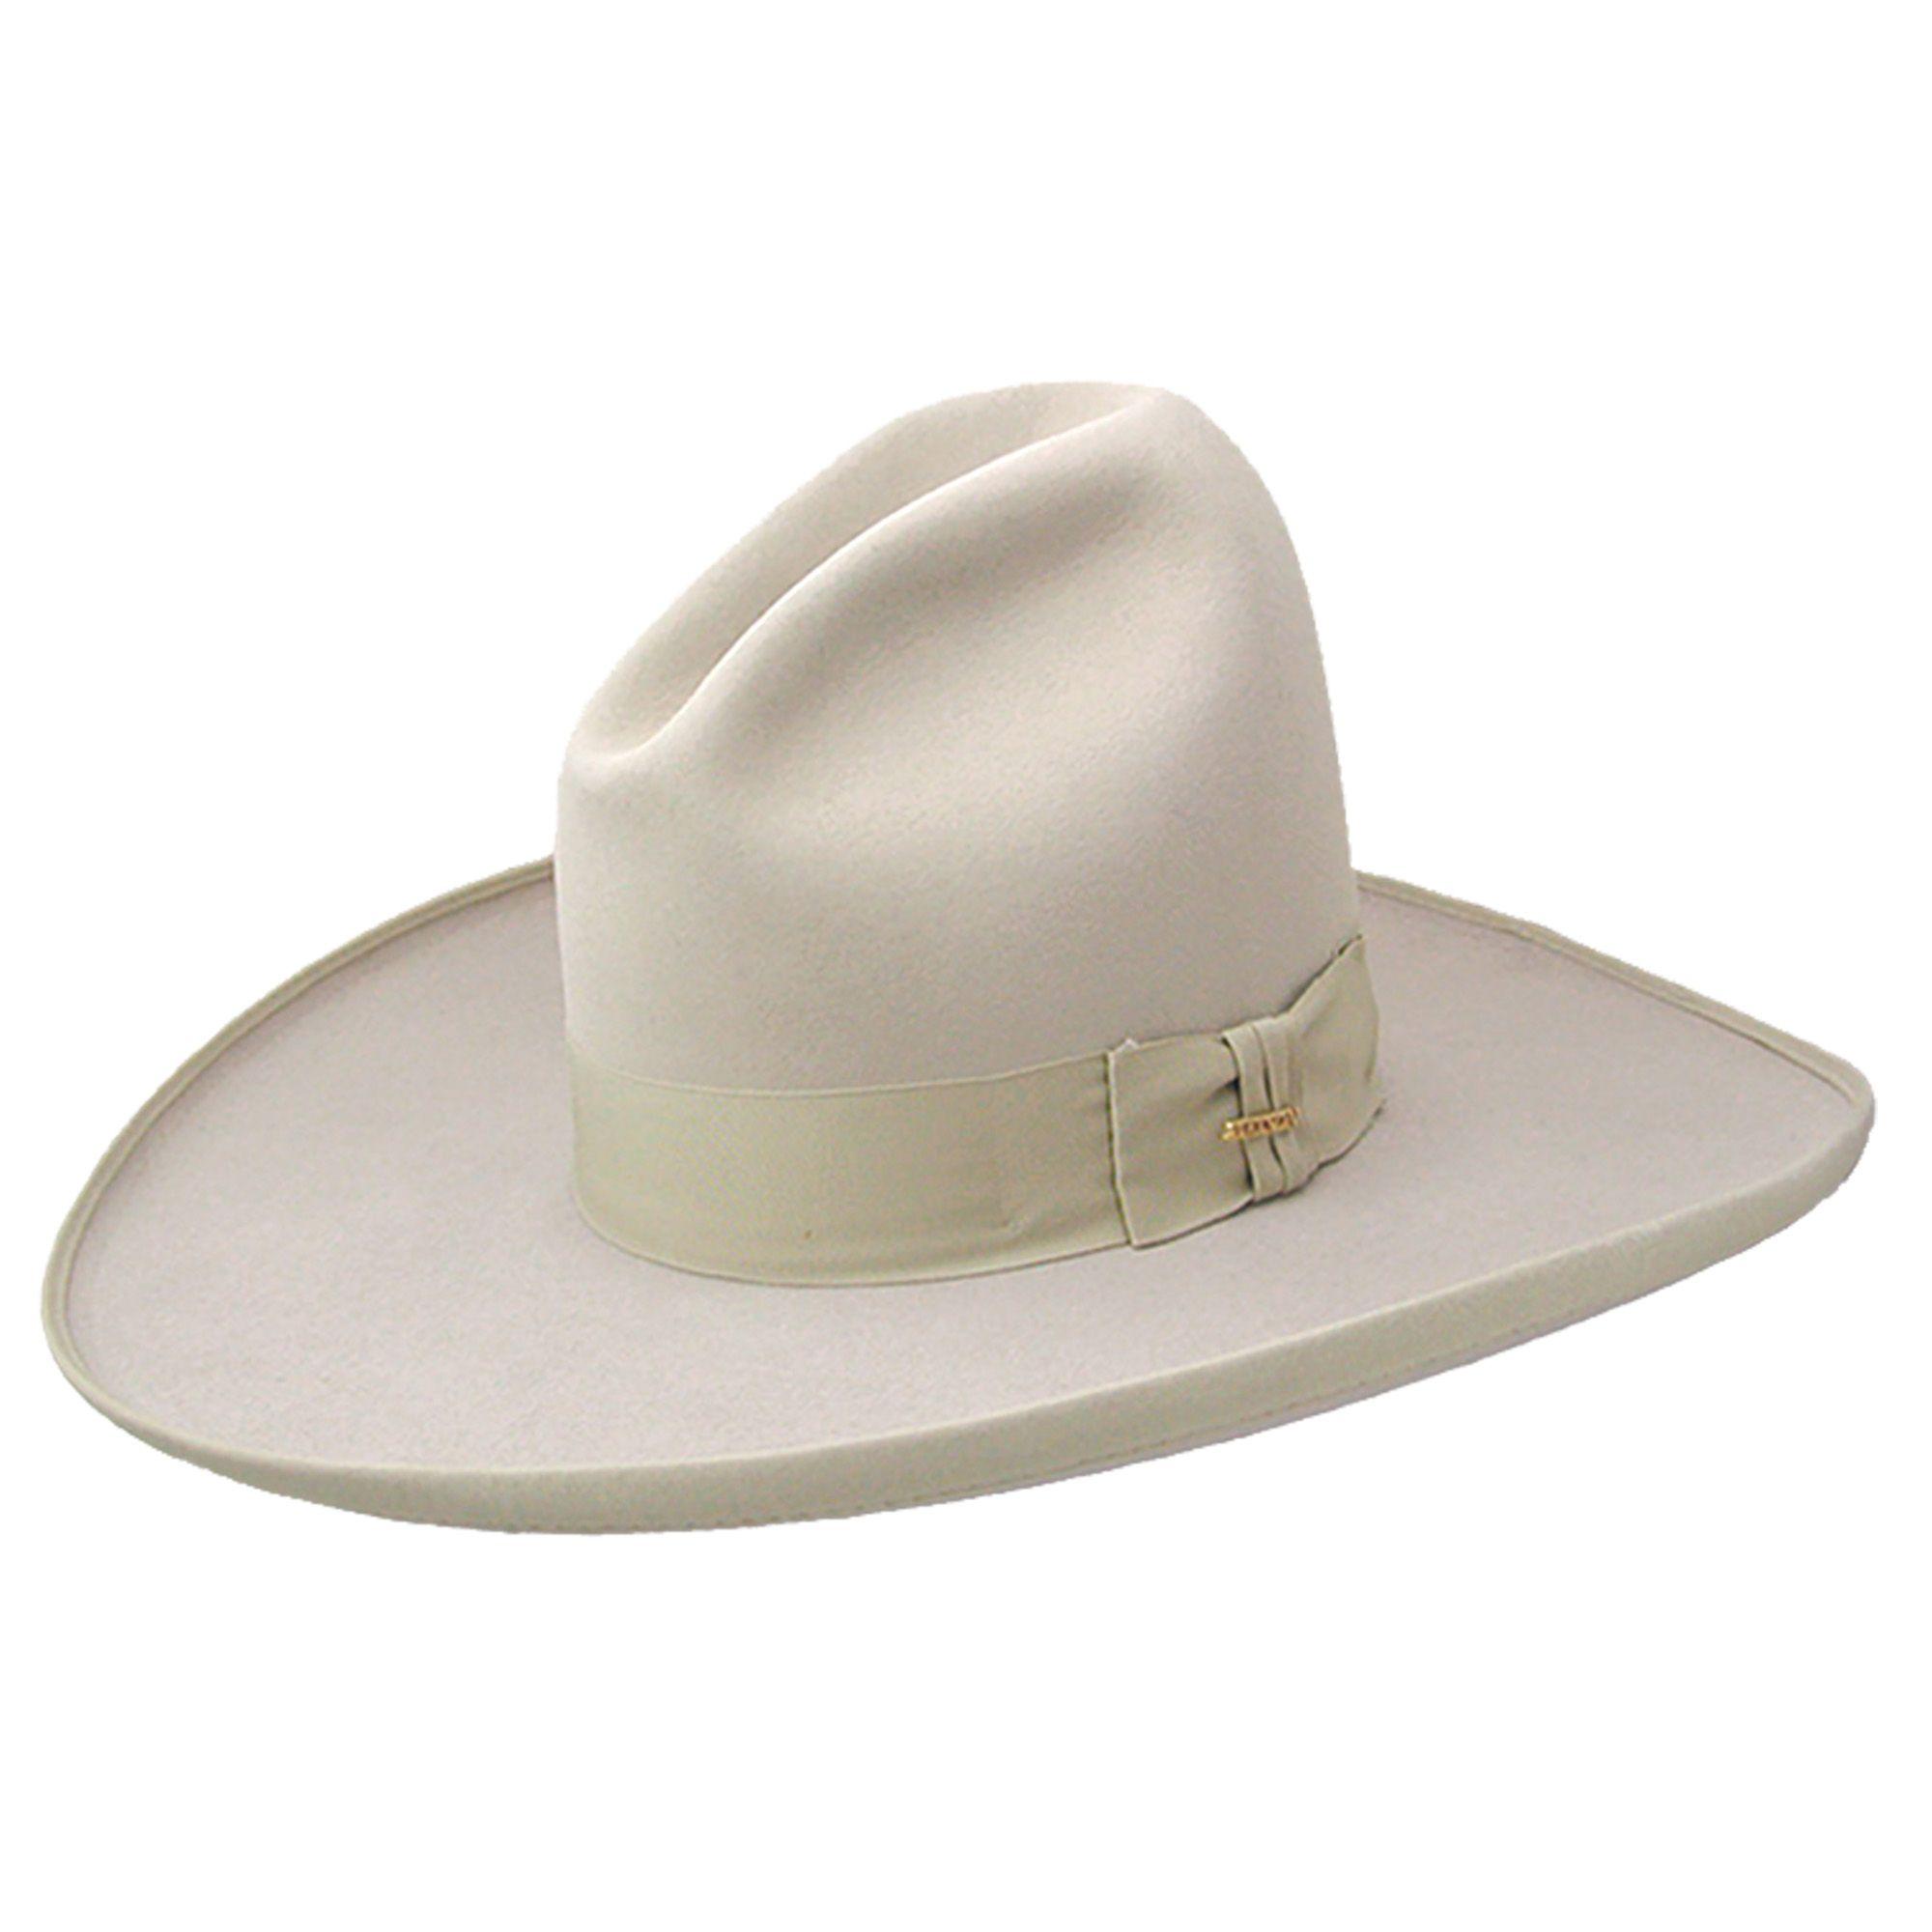 8301794dca285 Tom Mix Western Hats